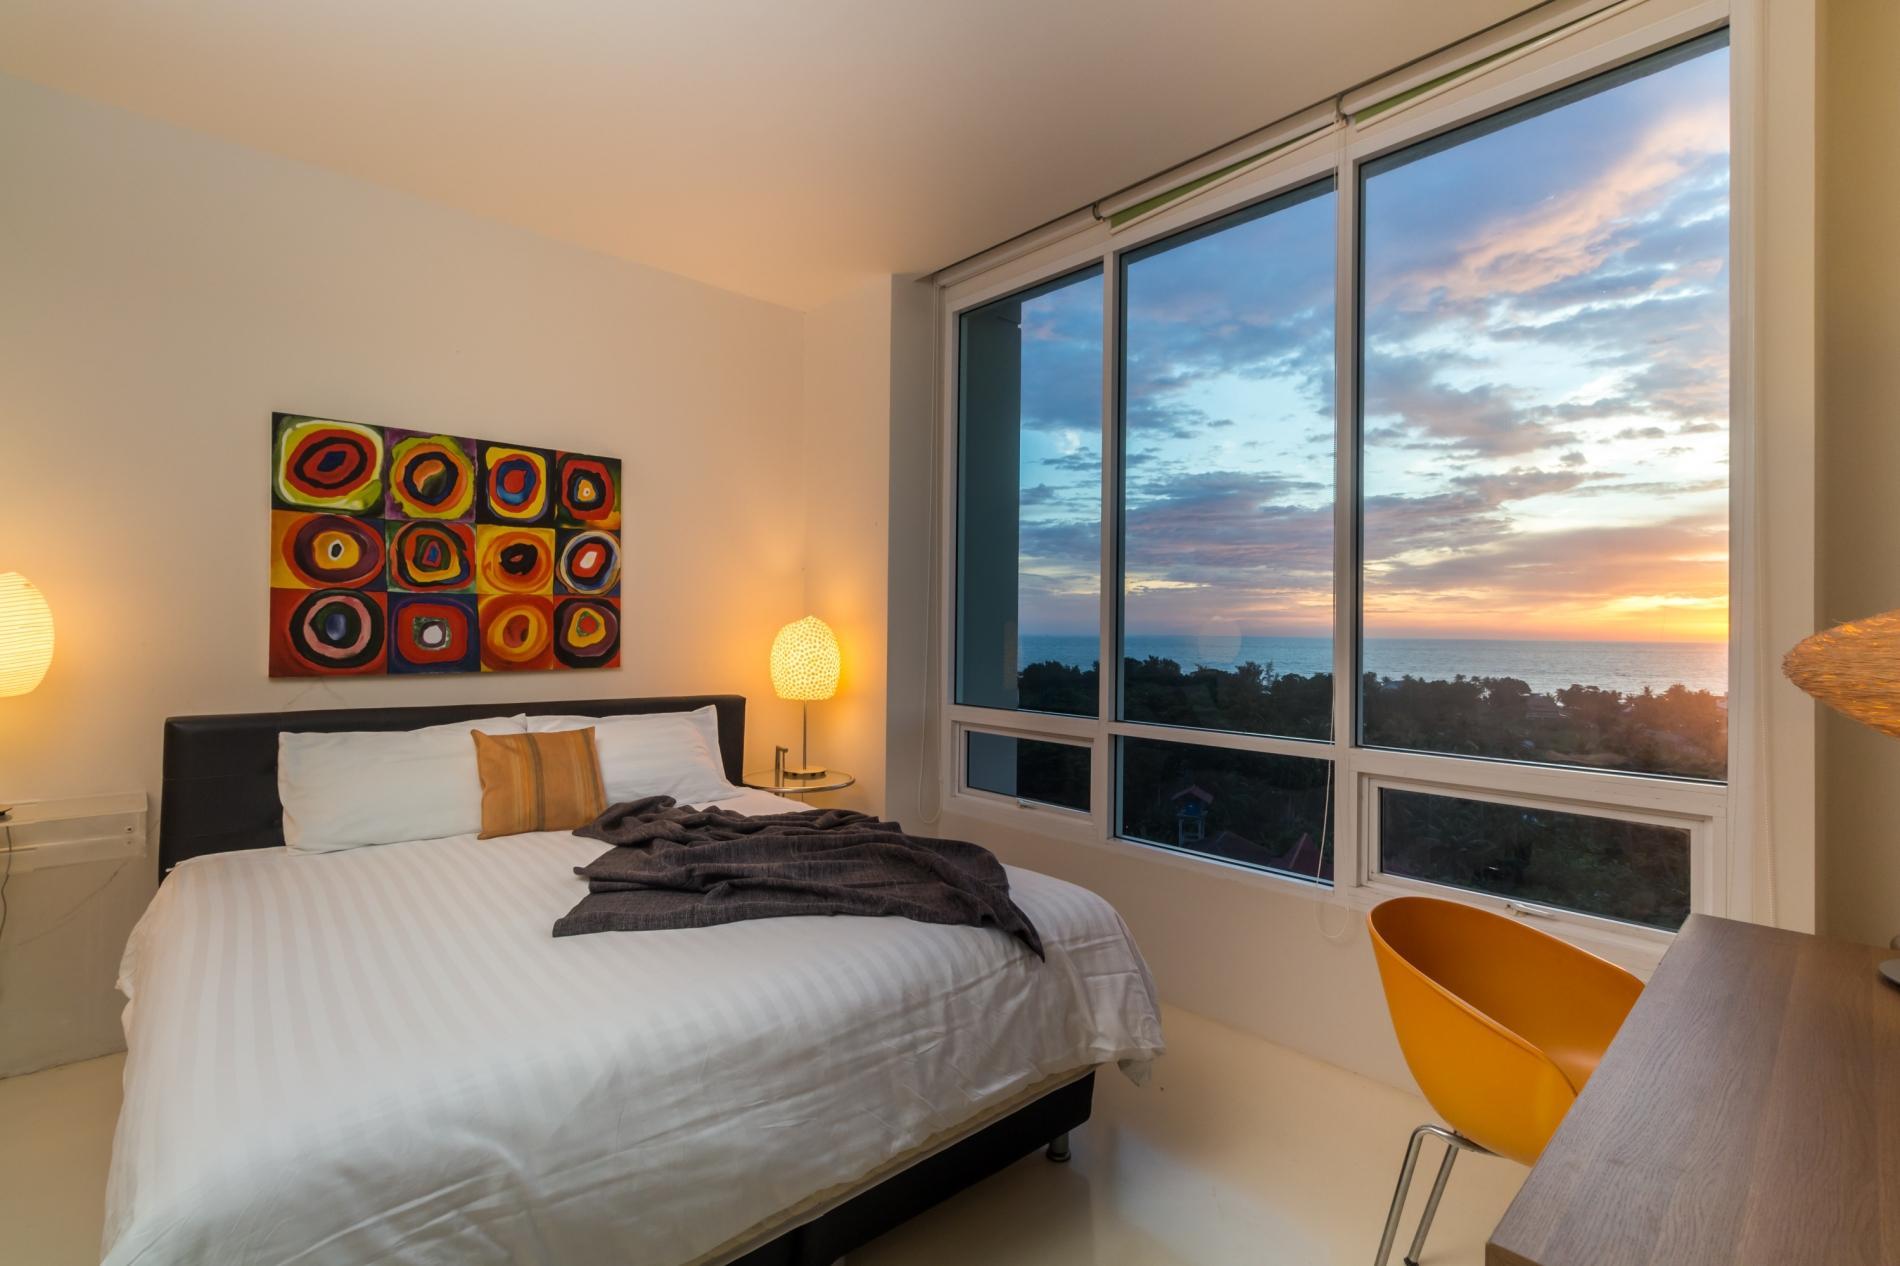 Apartment KH2605 - Sea-view Penthouse in Karon  walk to beach  restaurants  bars  shops photo 20257345